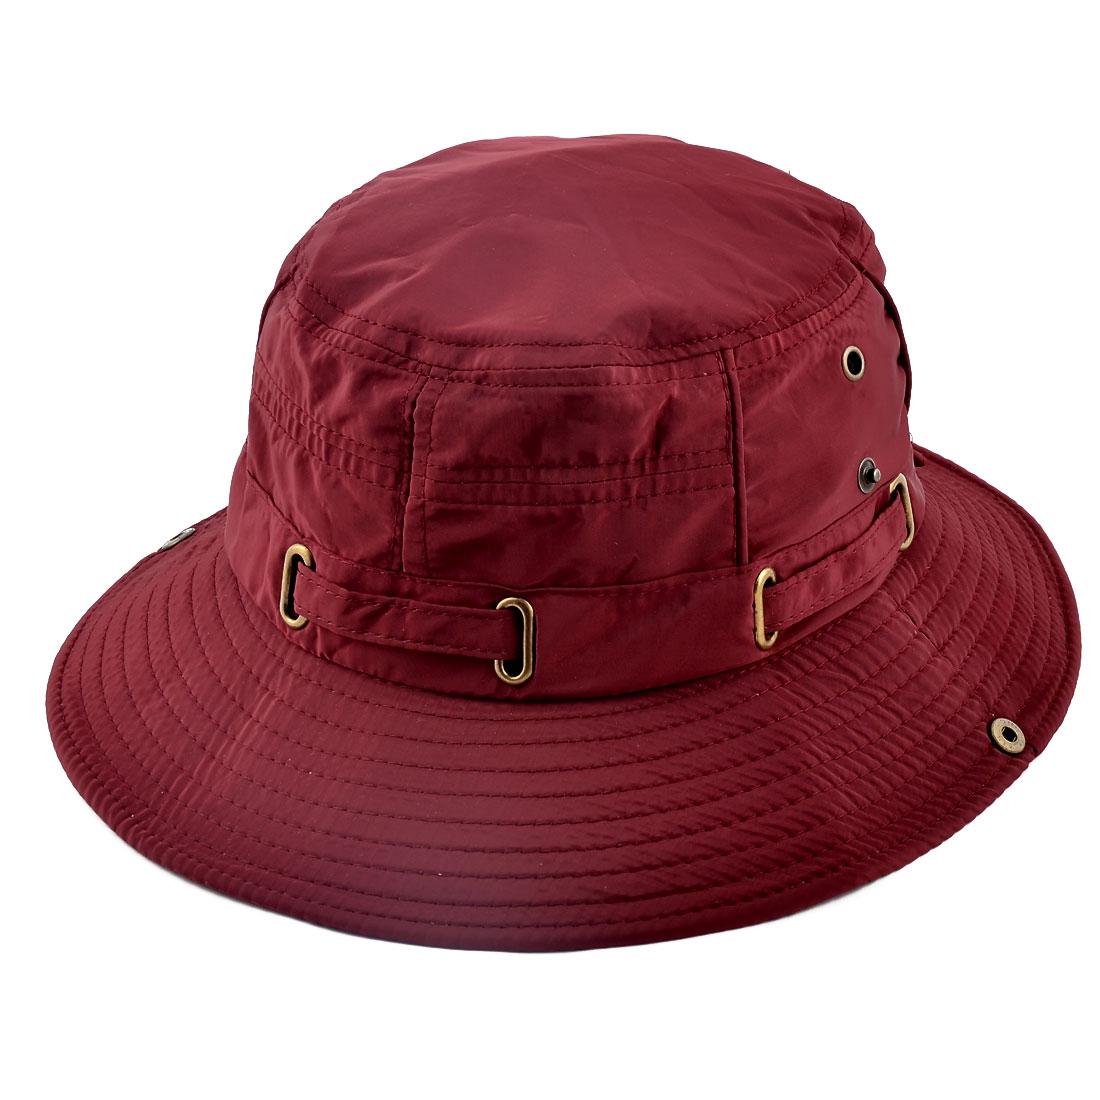 Fisherman Cotton Blends Outdoor Sports Mountaineering Hunting Adjustable Strap Wide Brim Bucket Summer Cap Fishing Hat Burgundy